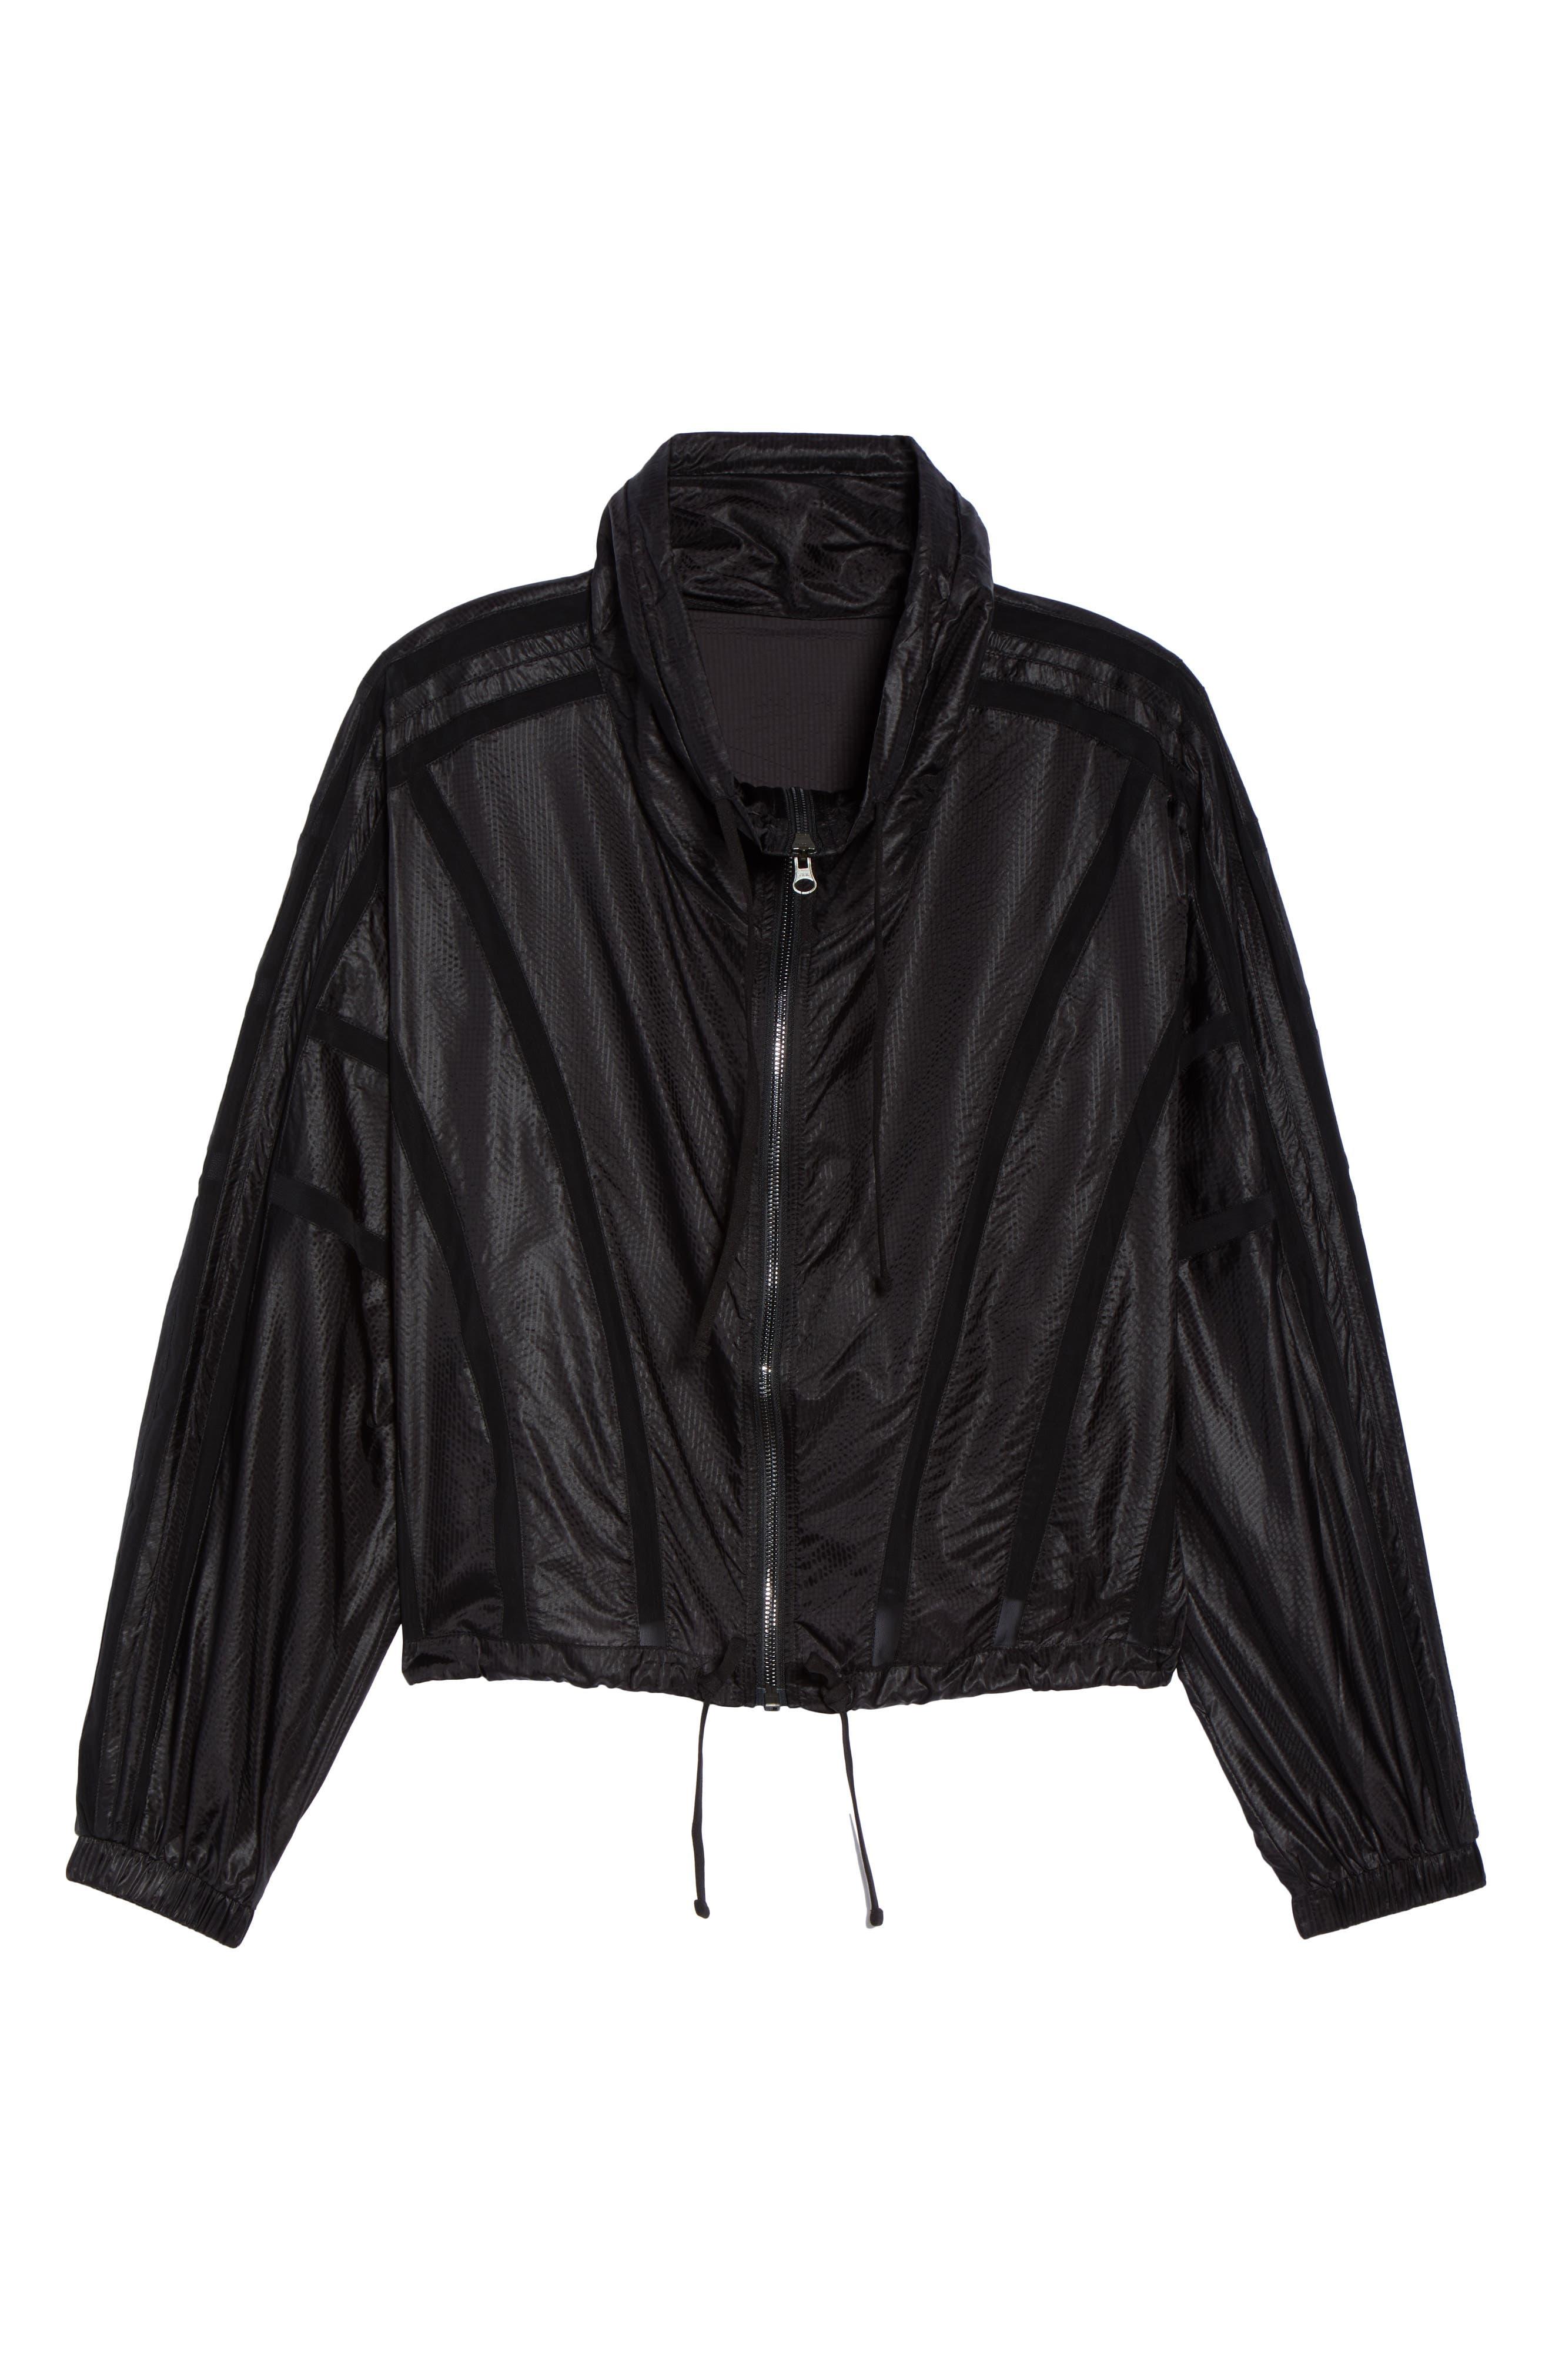 Stitch Jacket,                             Alternate thumbnail 6, color,                             BLACK